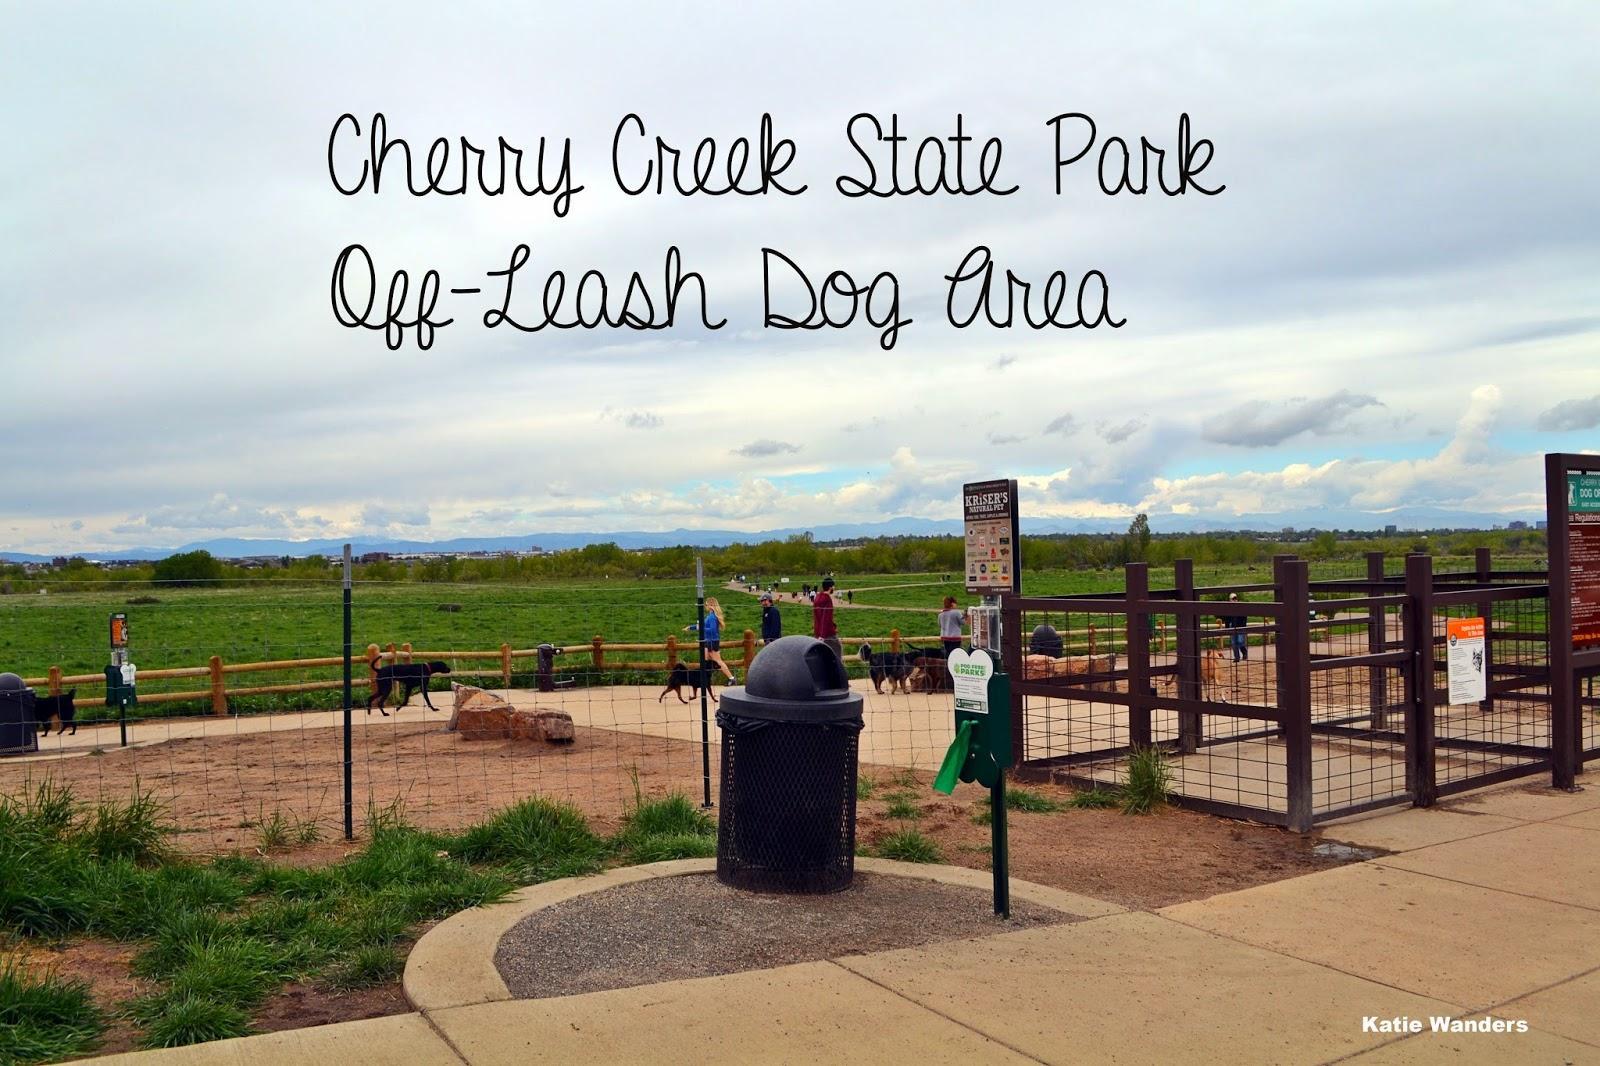 Katie wanders denver colorado for Cherry creek